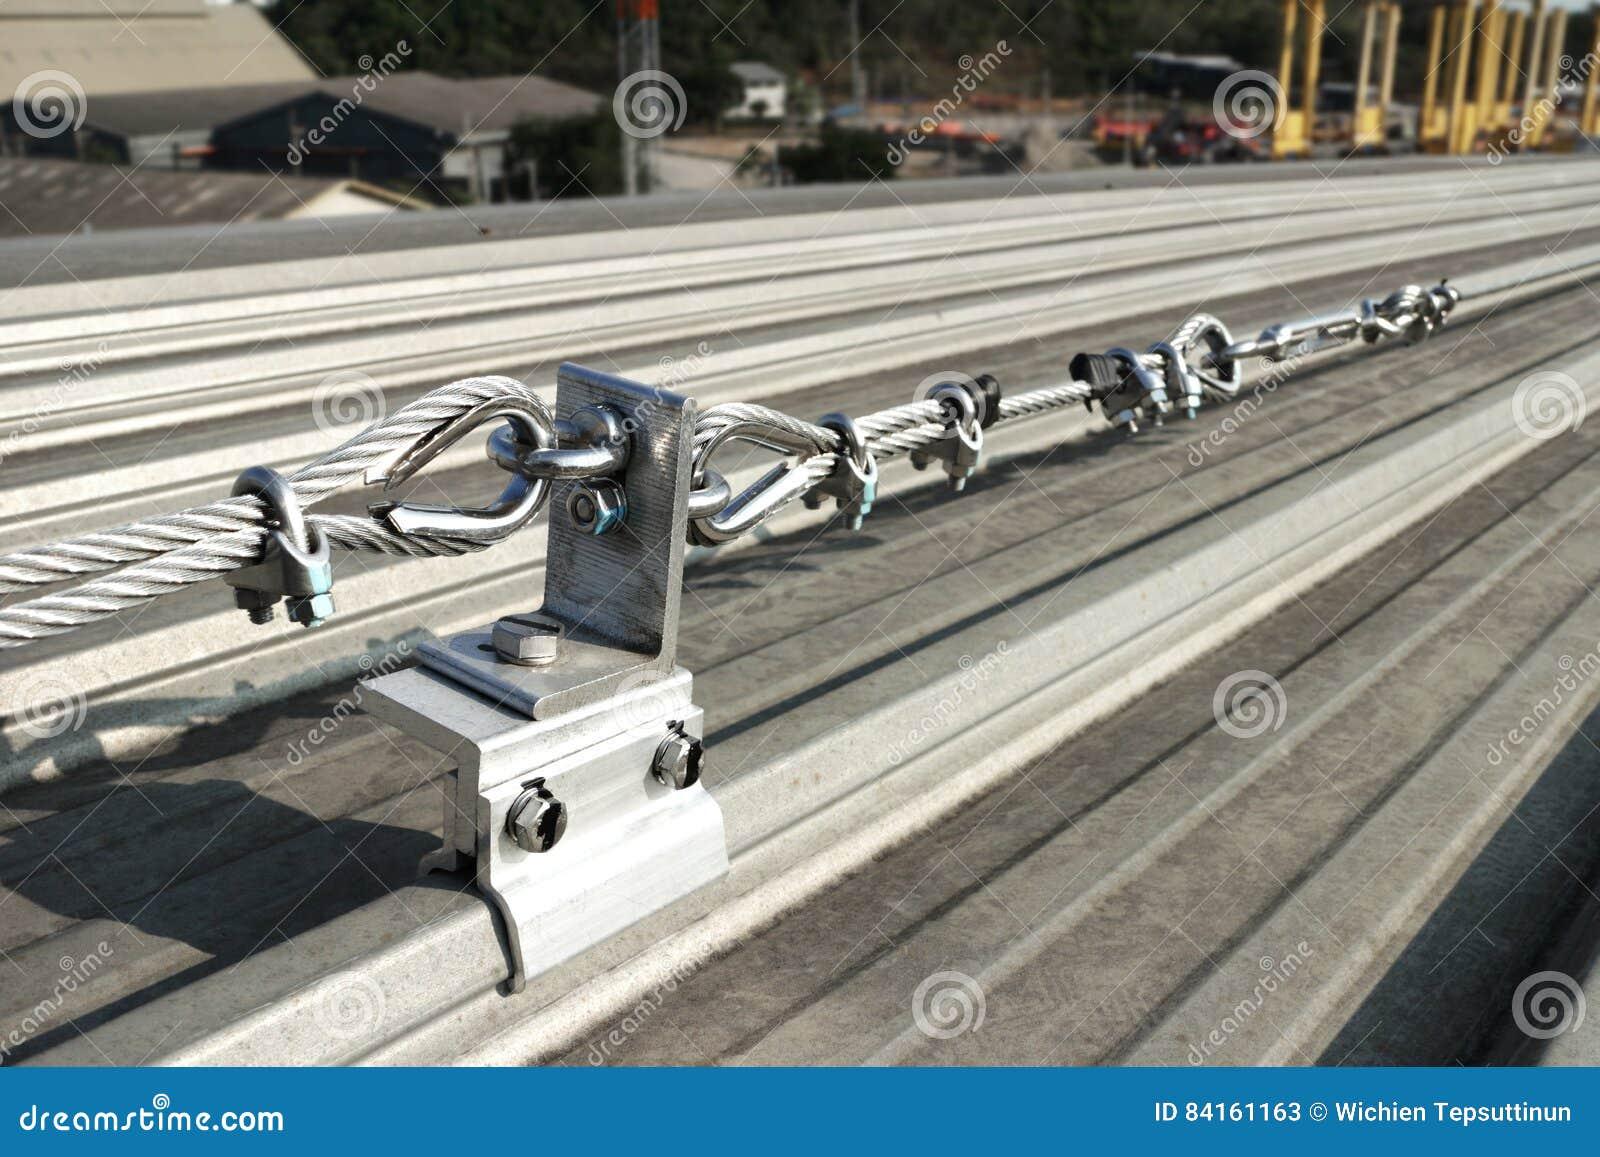 Steel Wire Rope Lifeline On Roof Stock Image - Image of belt ...